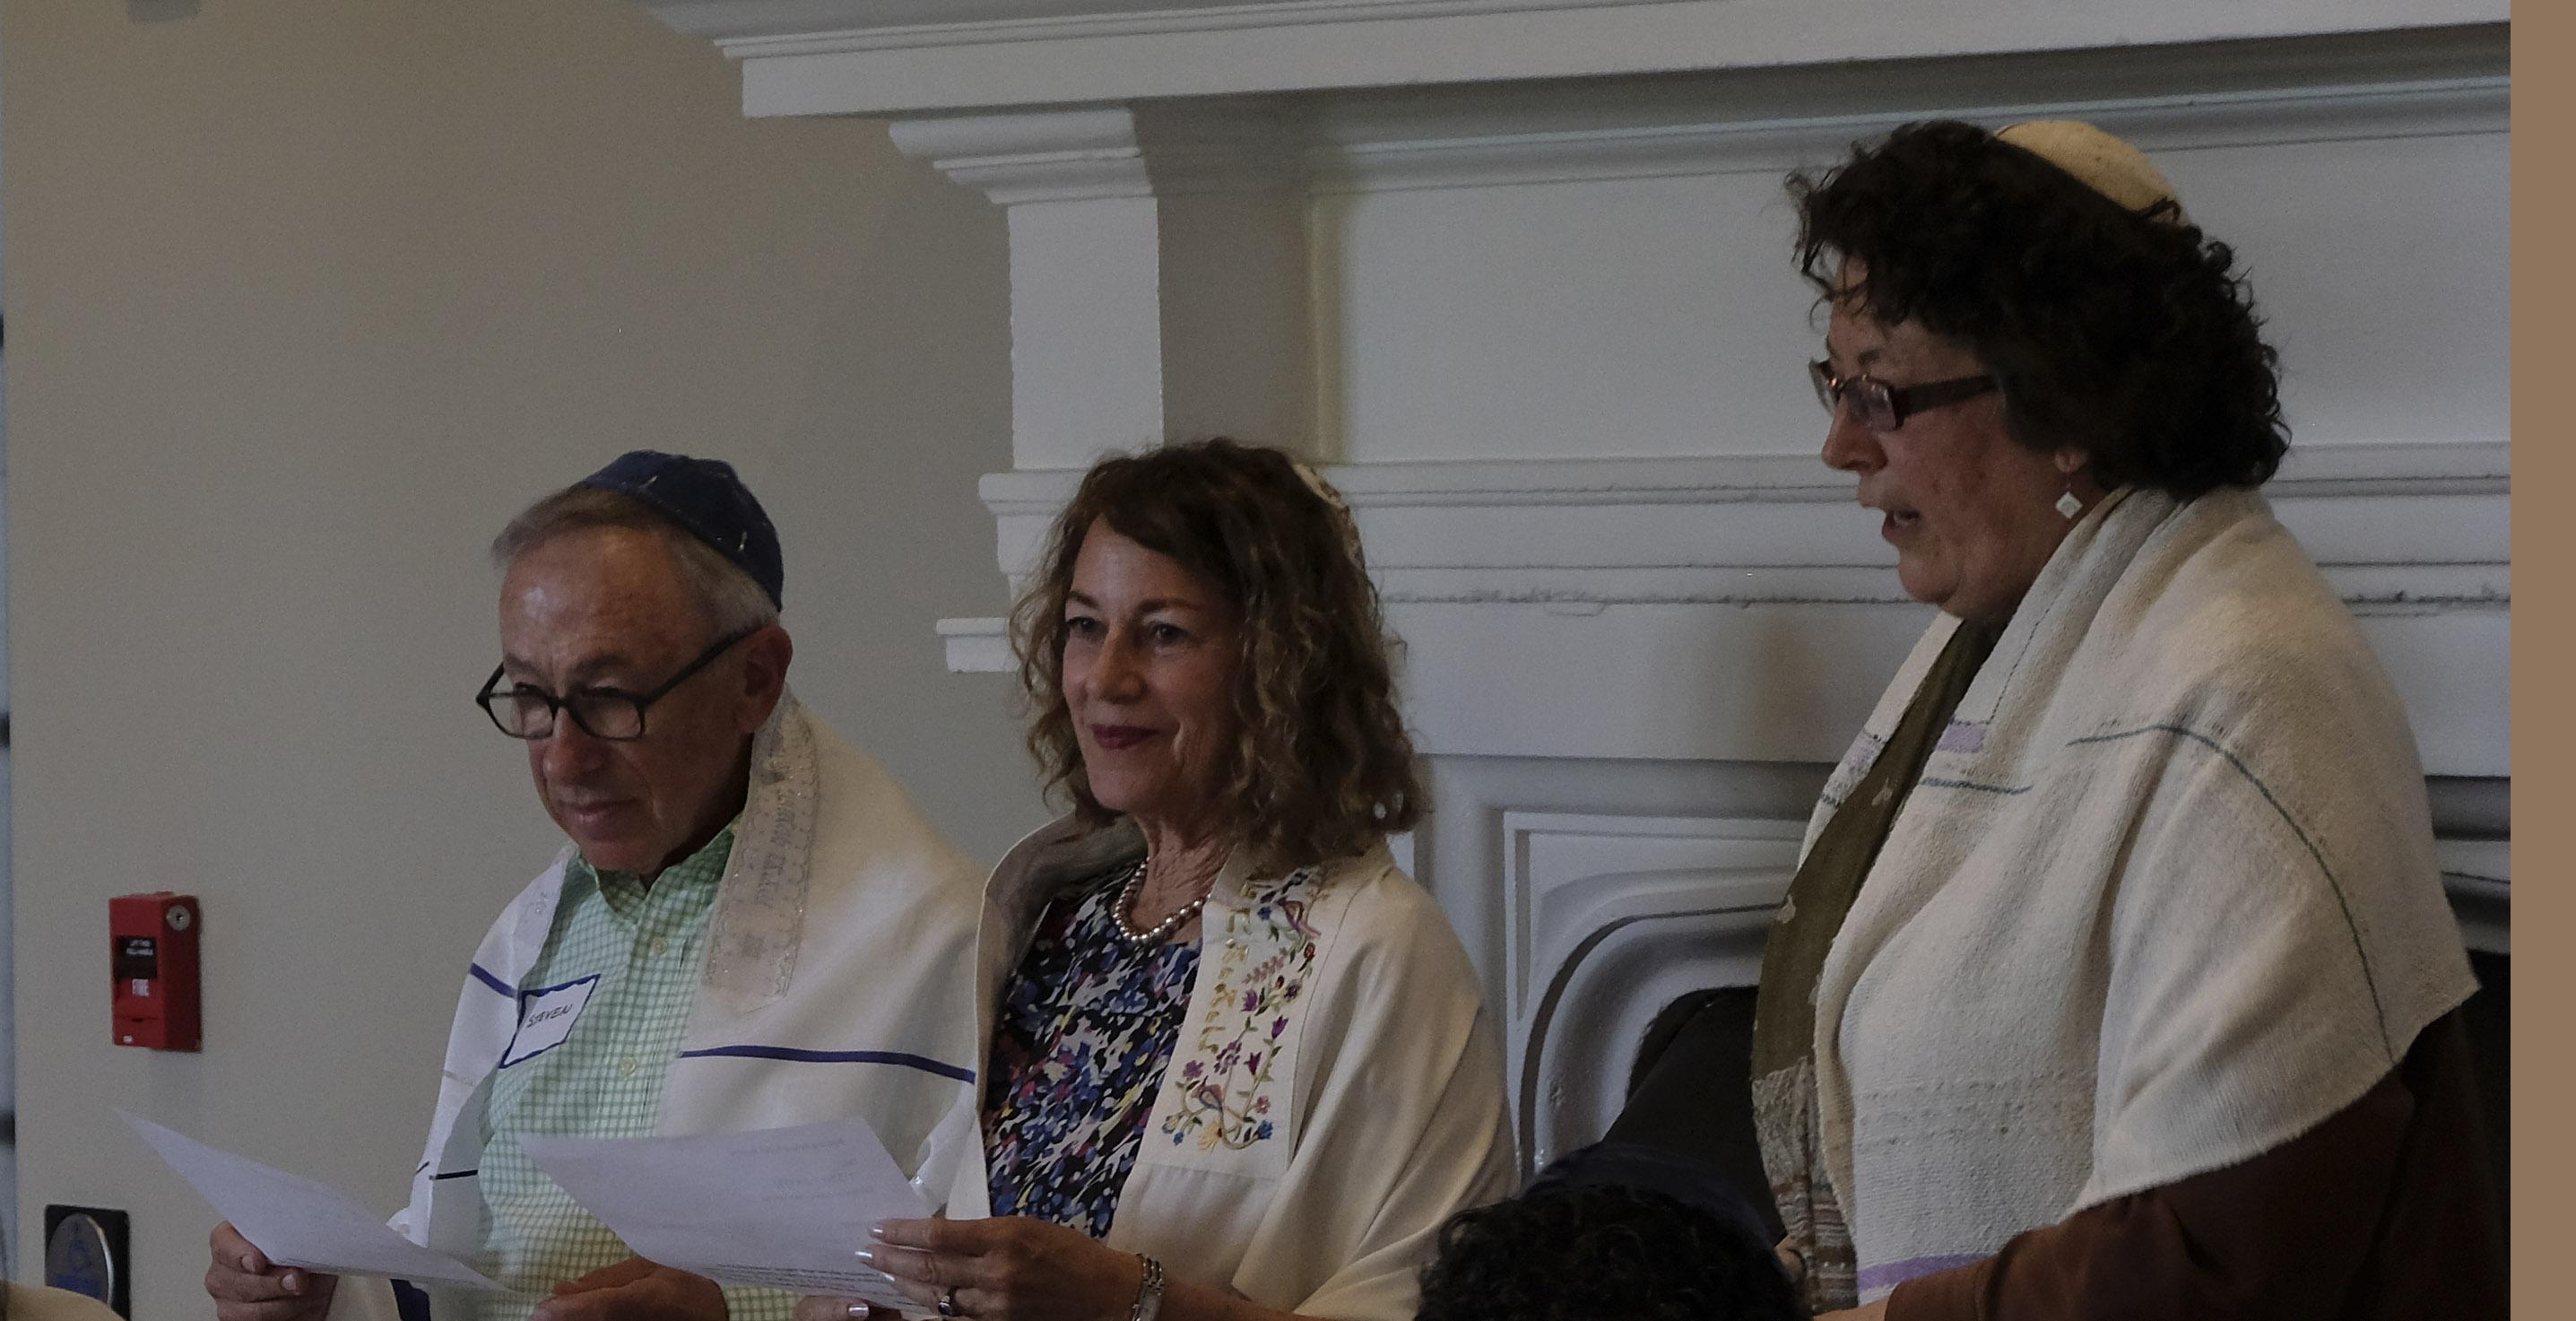 Steve and Linda Wolan with Rabbi Bridget Wynne (right)